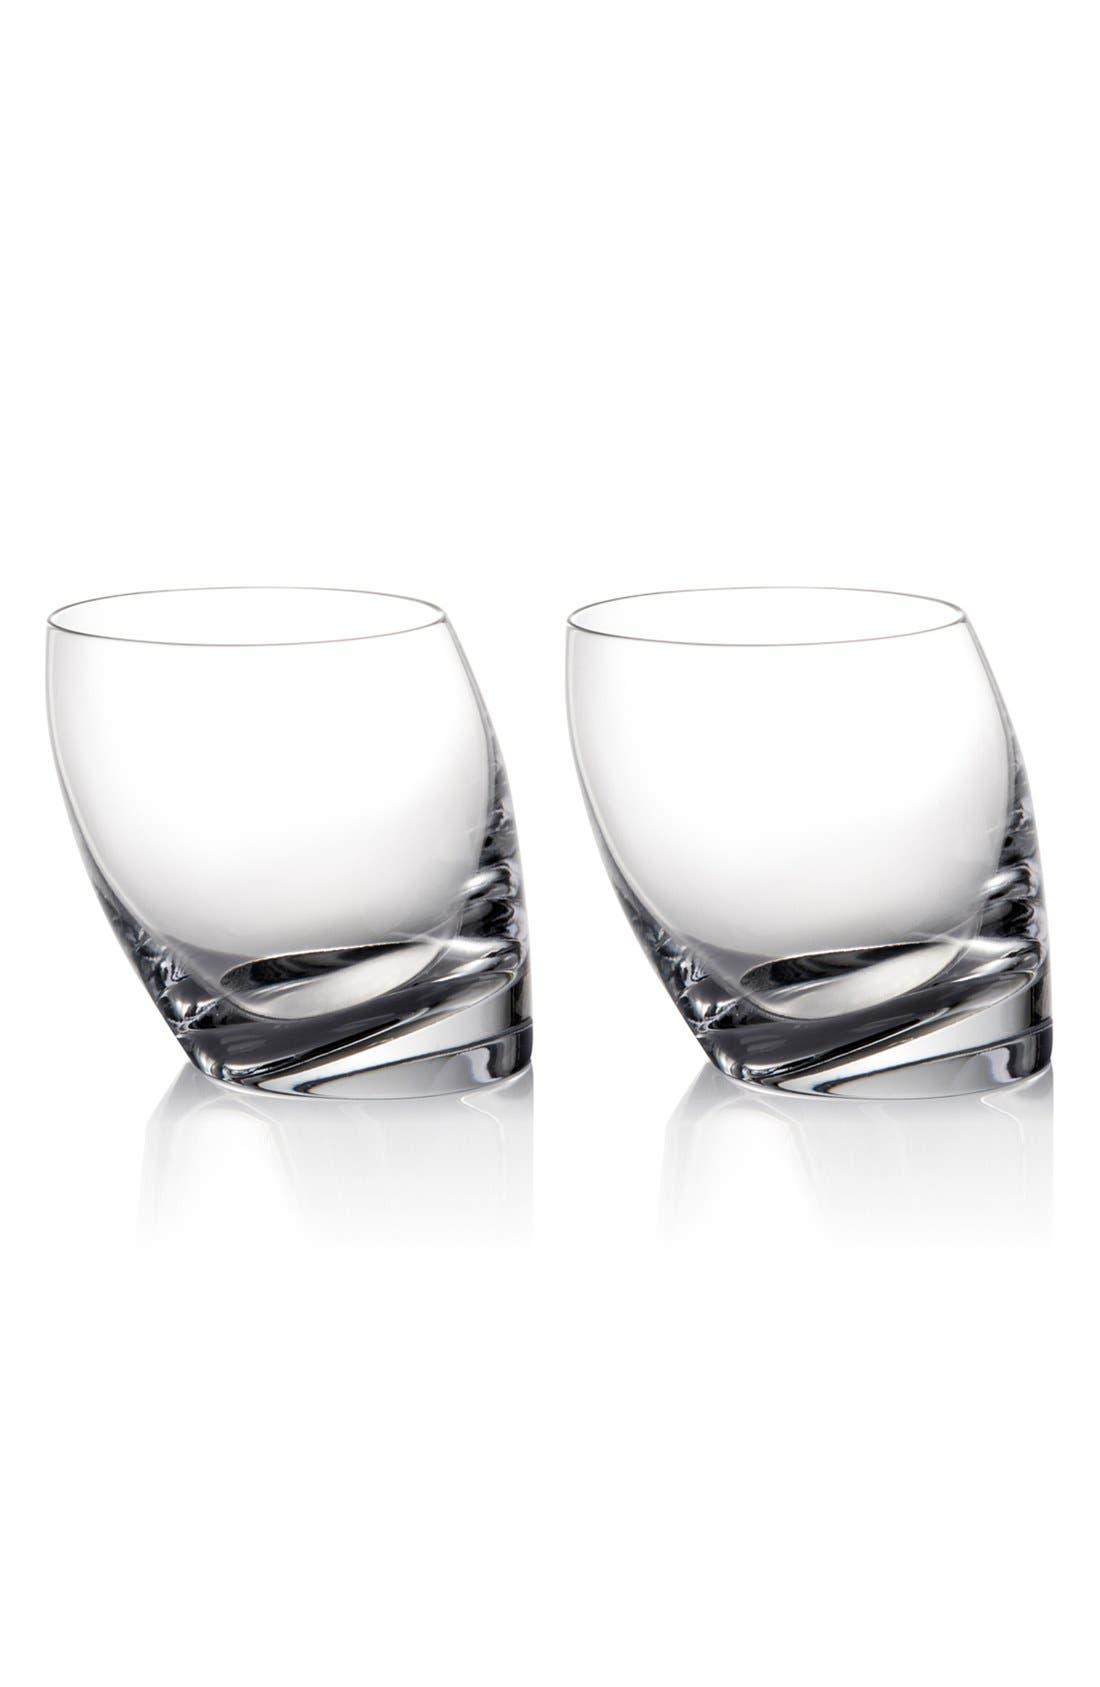 'Tilt' Double Old-Fashioned Glasses,                             Main thumbnail 1, color,                             000